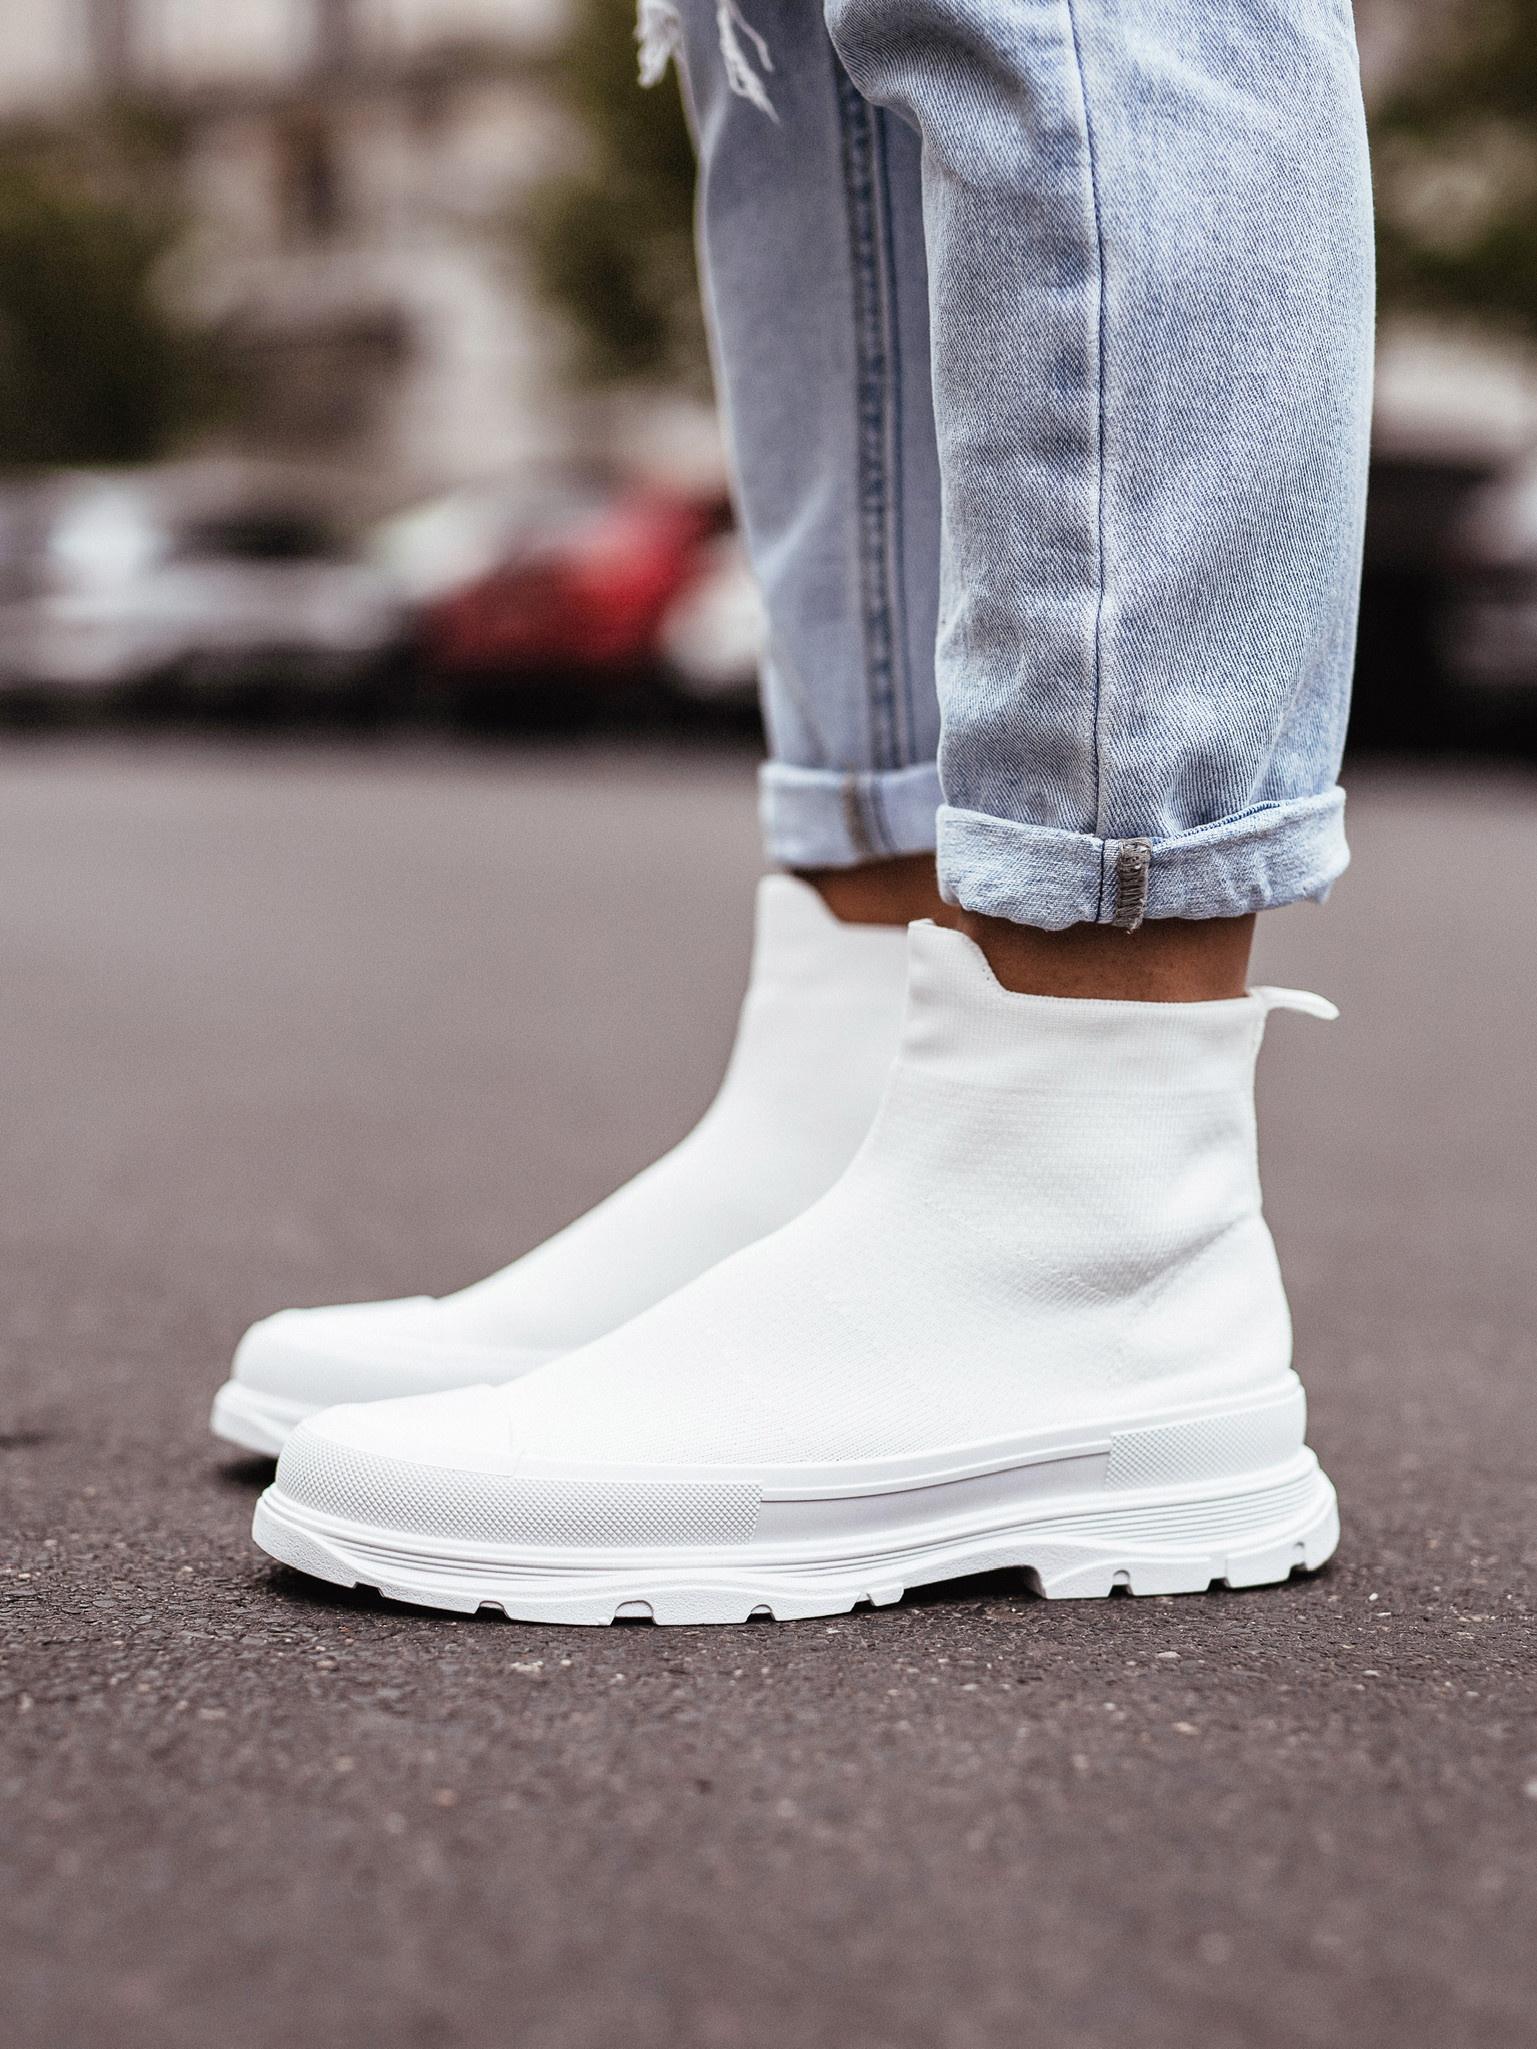 Adidasy Miles white